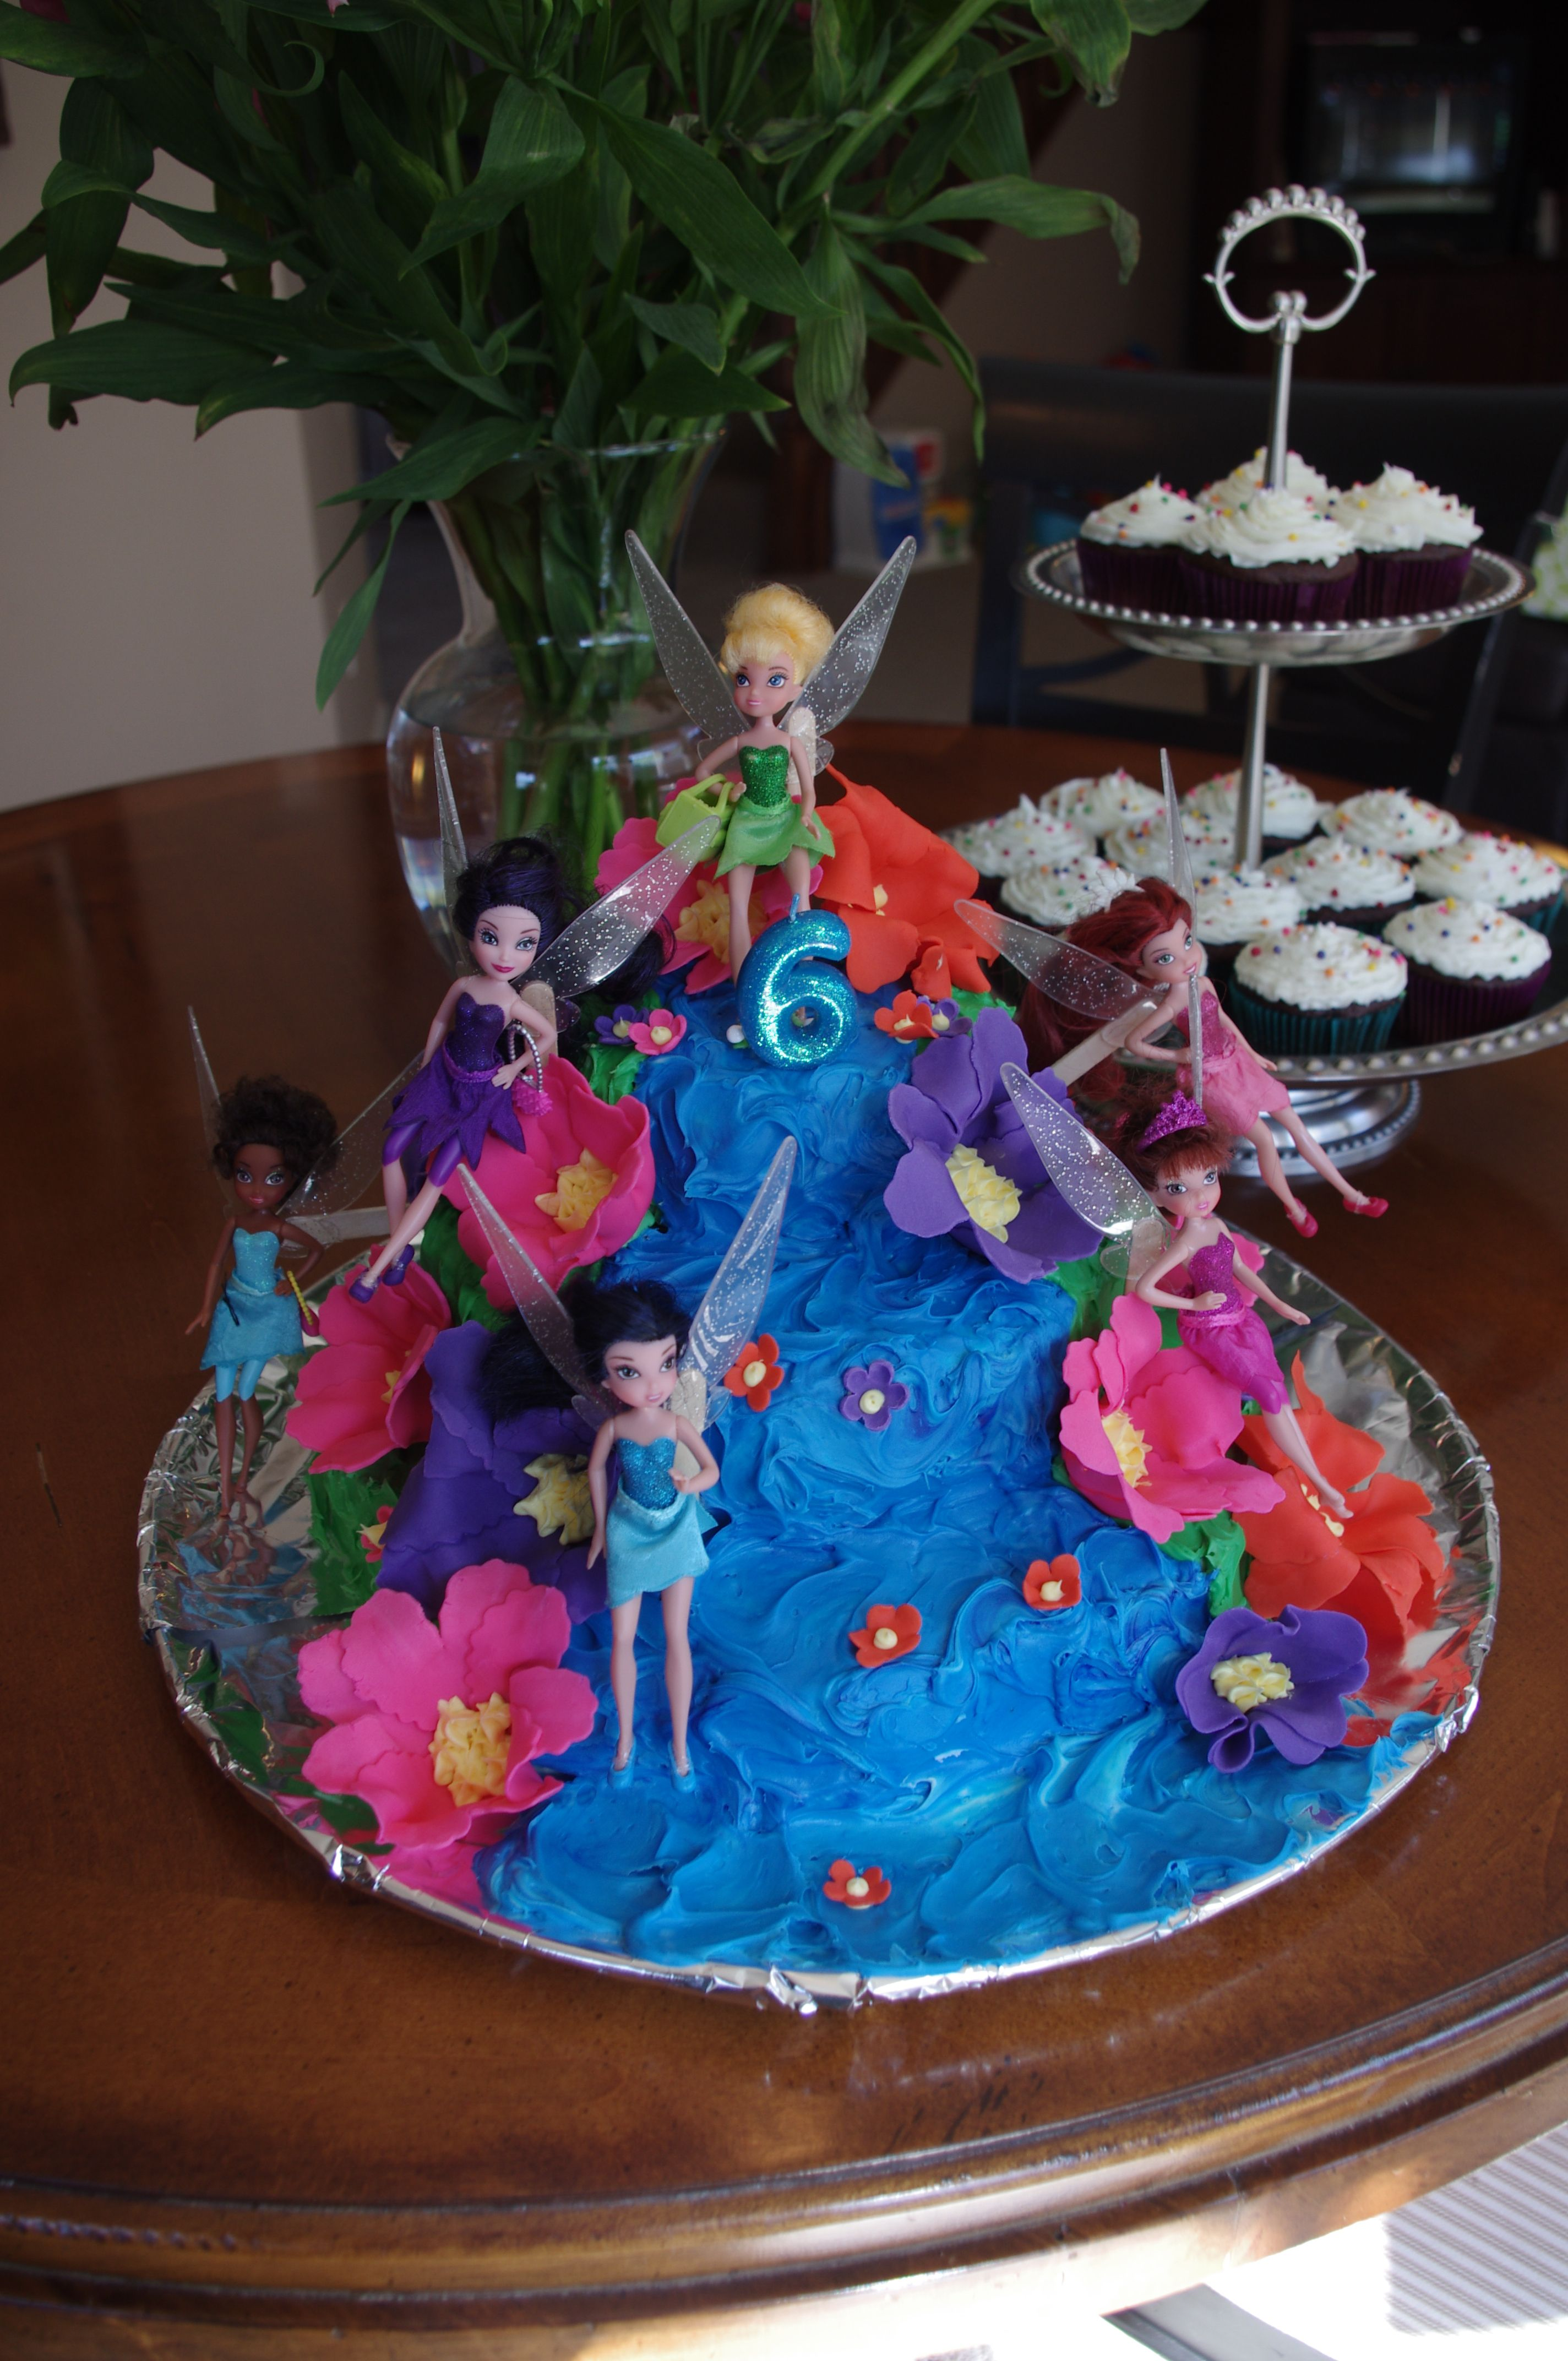 Strange Tinkerbell Cake For My Baby Girls 6Th Birthday 6Th Birthday Funny Birthday Cards Online Barepcheapnameinfo